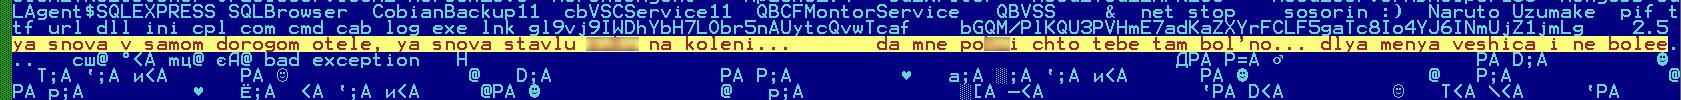 JSworm malware 12